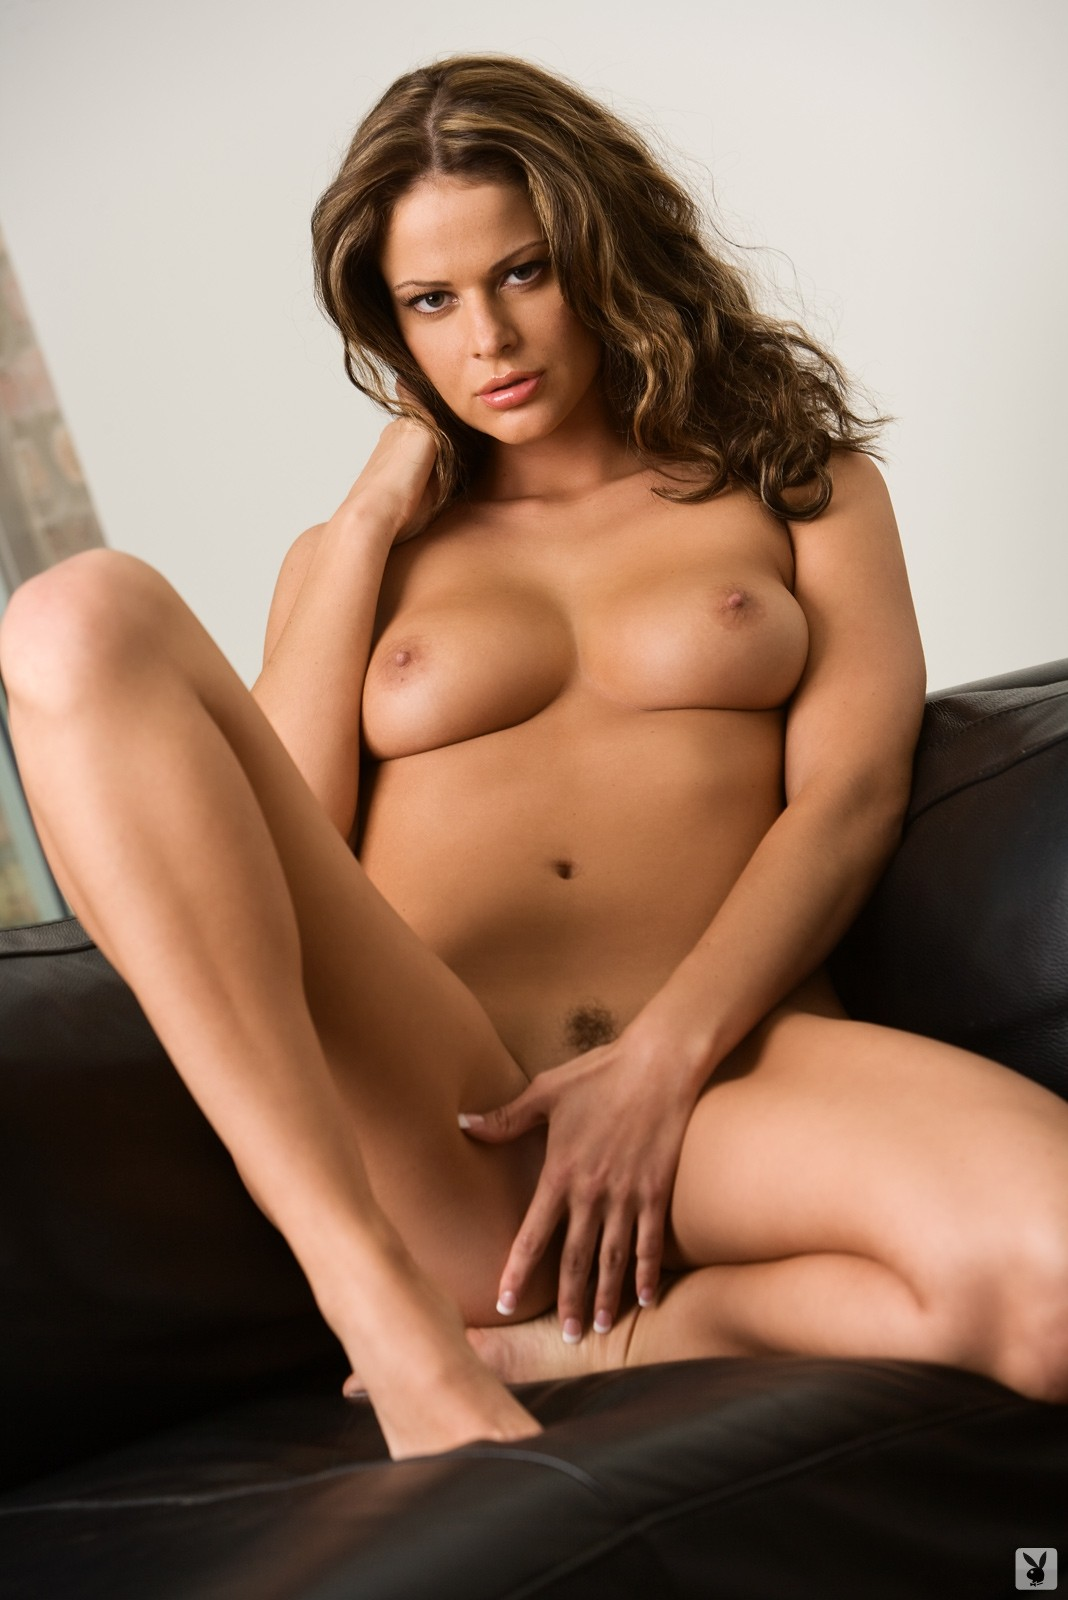 CelebGate Ana de Armas See Through nudes (64 photo)